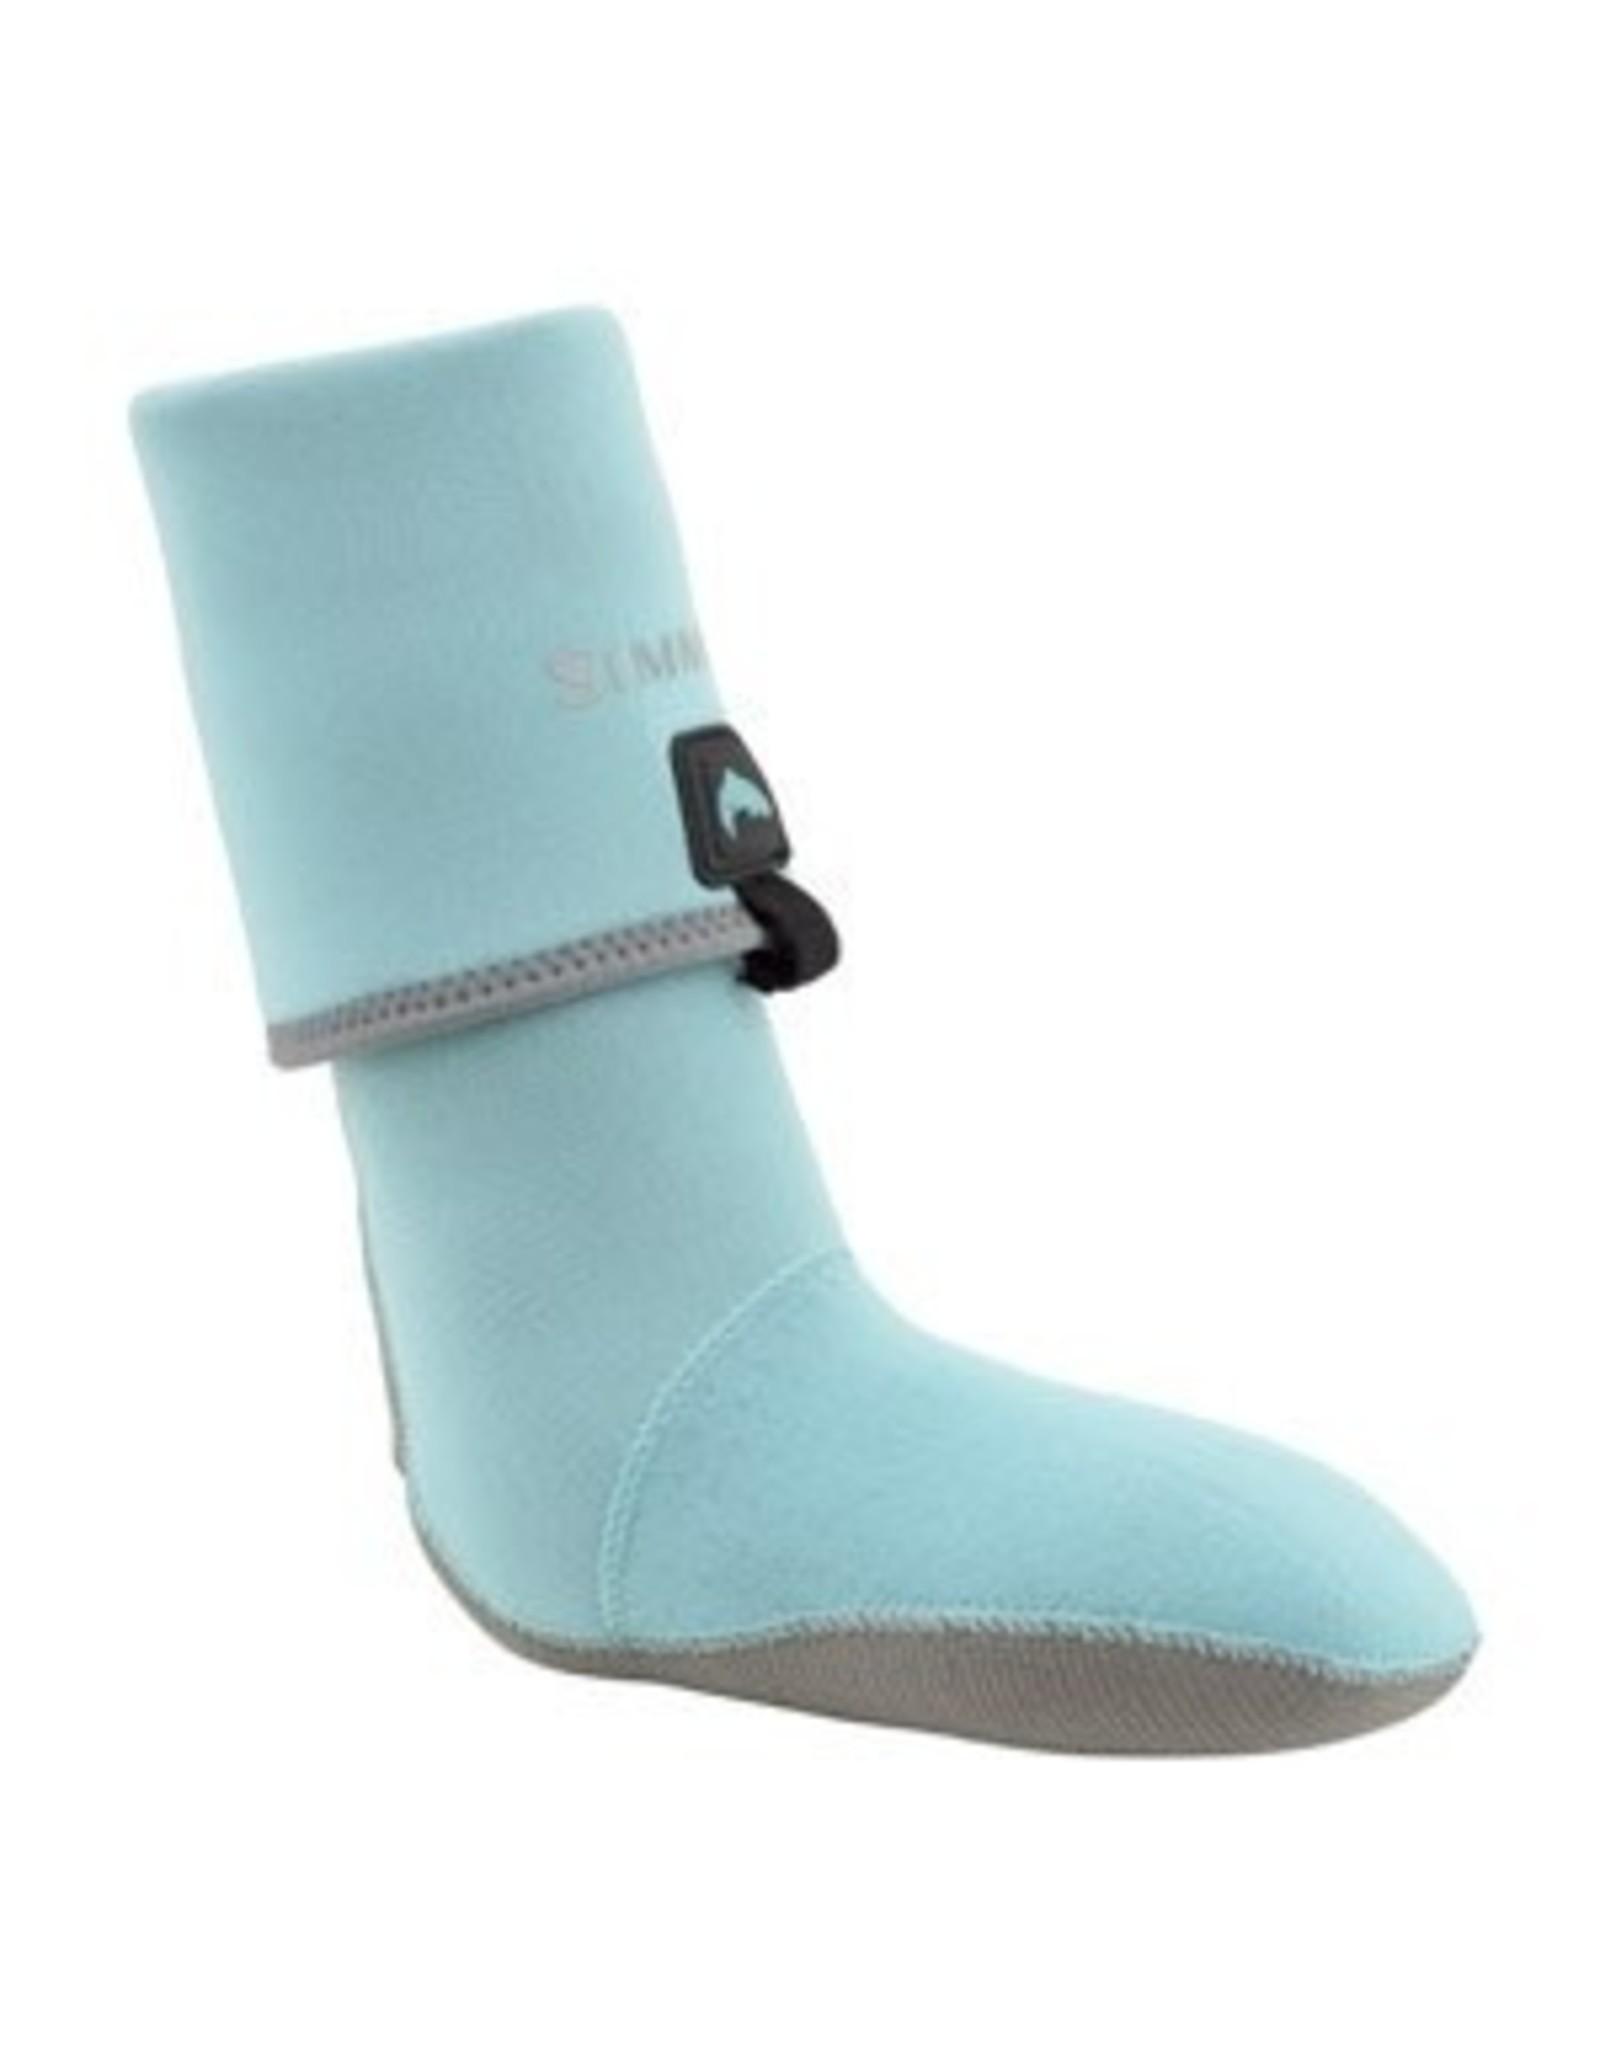 Simms Women's Guide Guard Socks - Aqua - Large